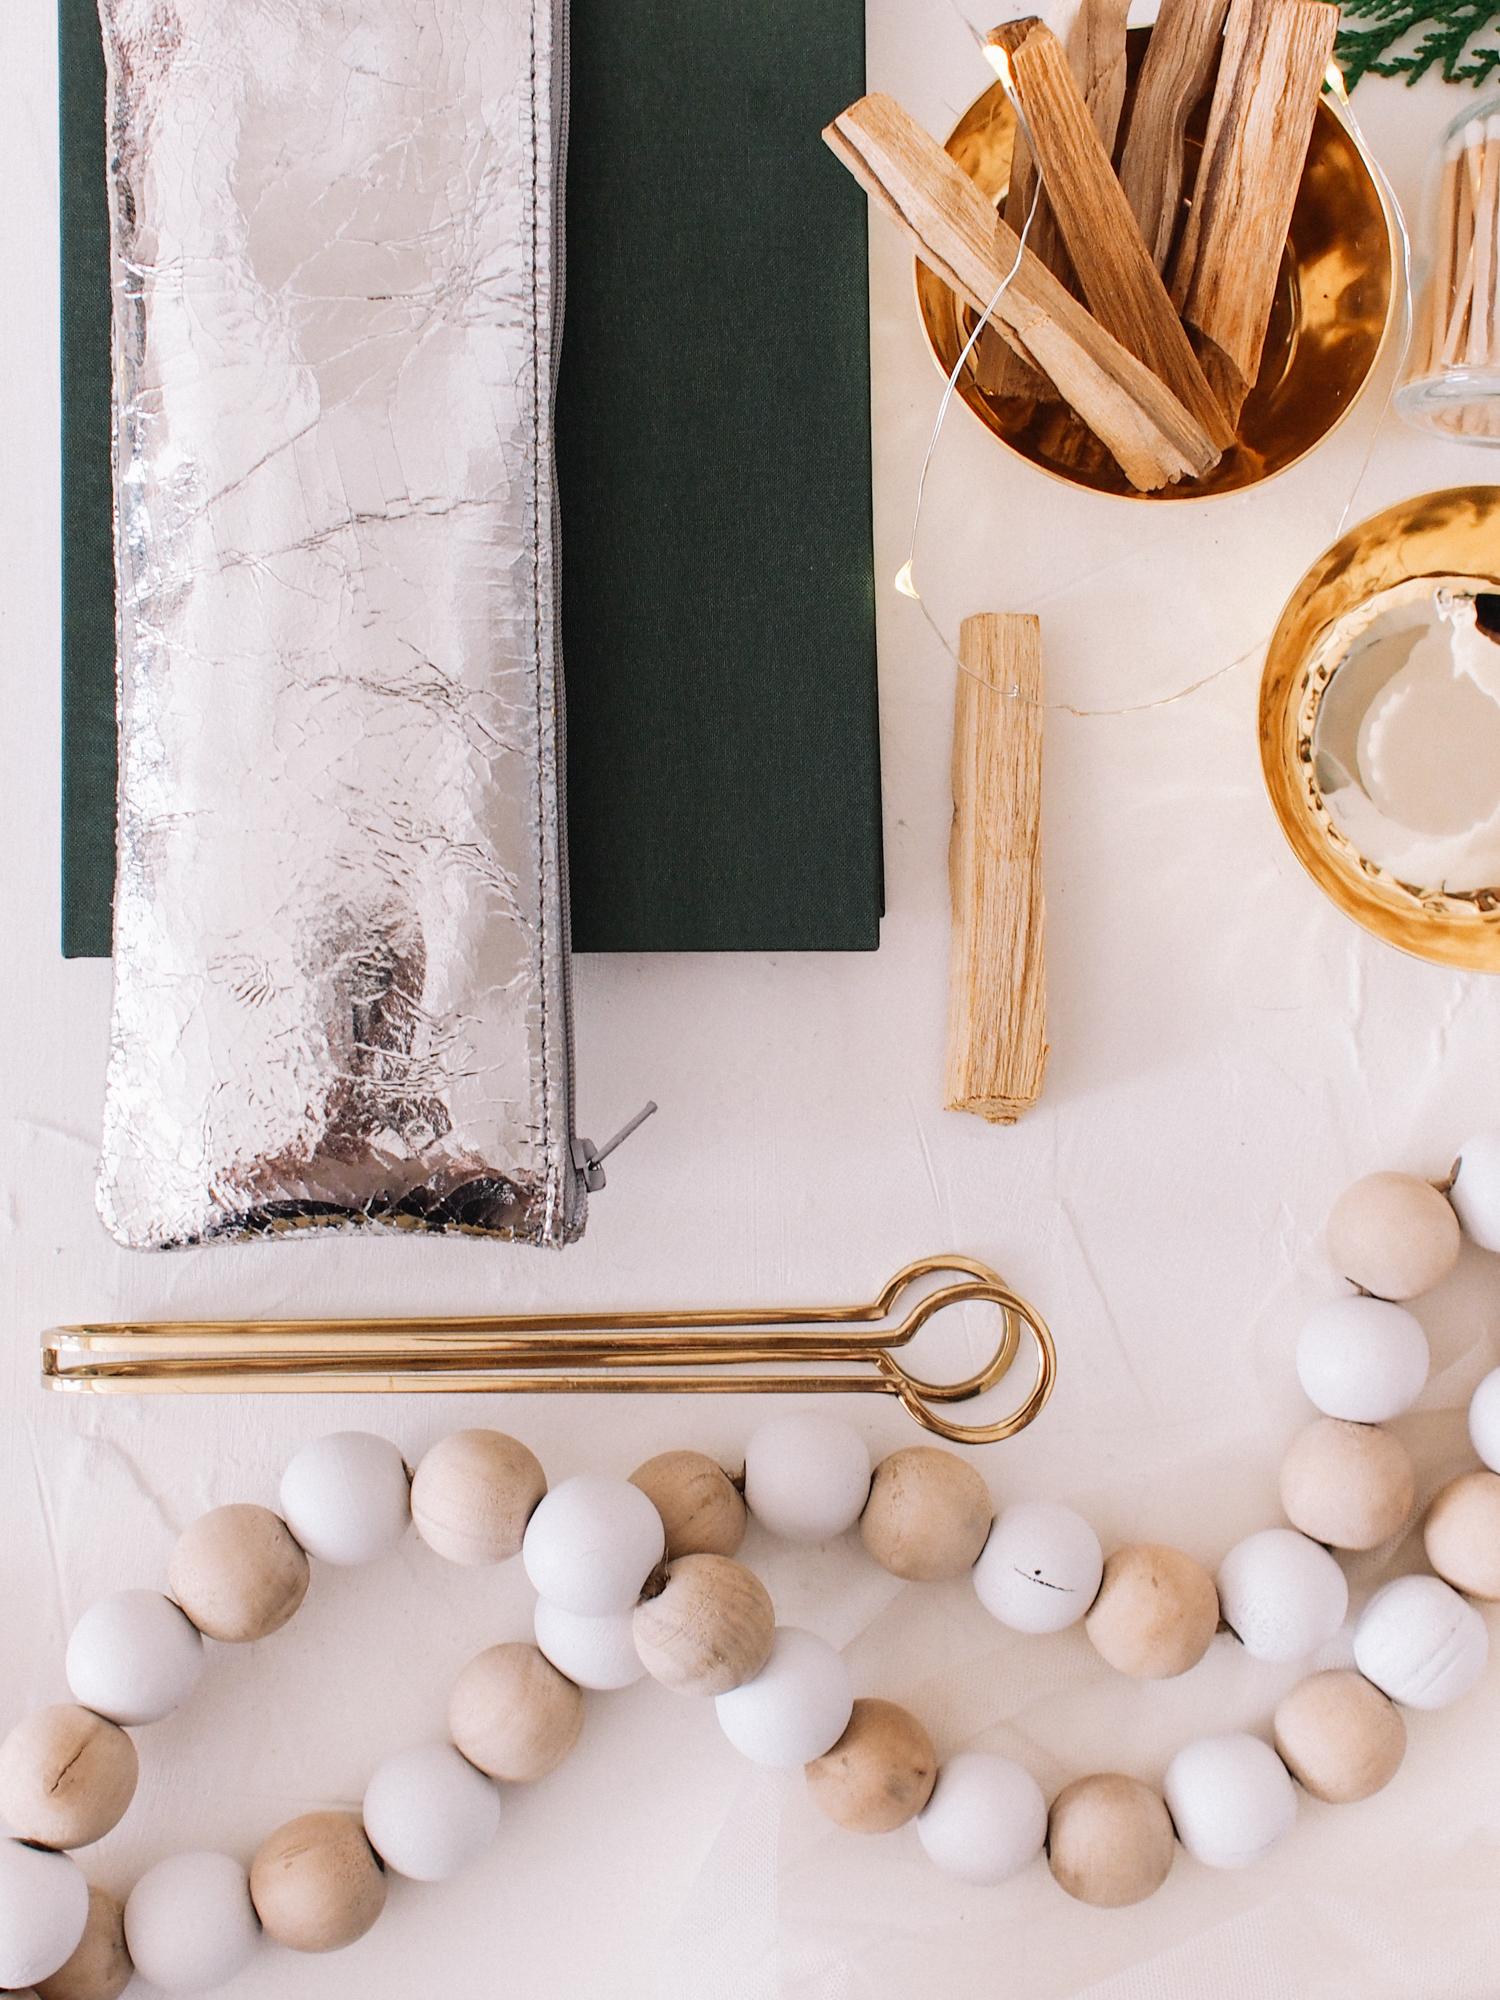 How to build a seasonal prop kit | A Fabulous Fete